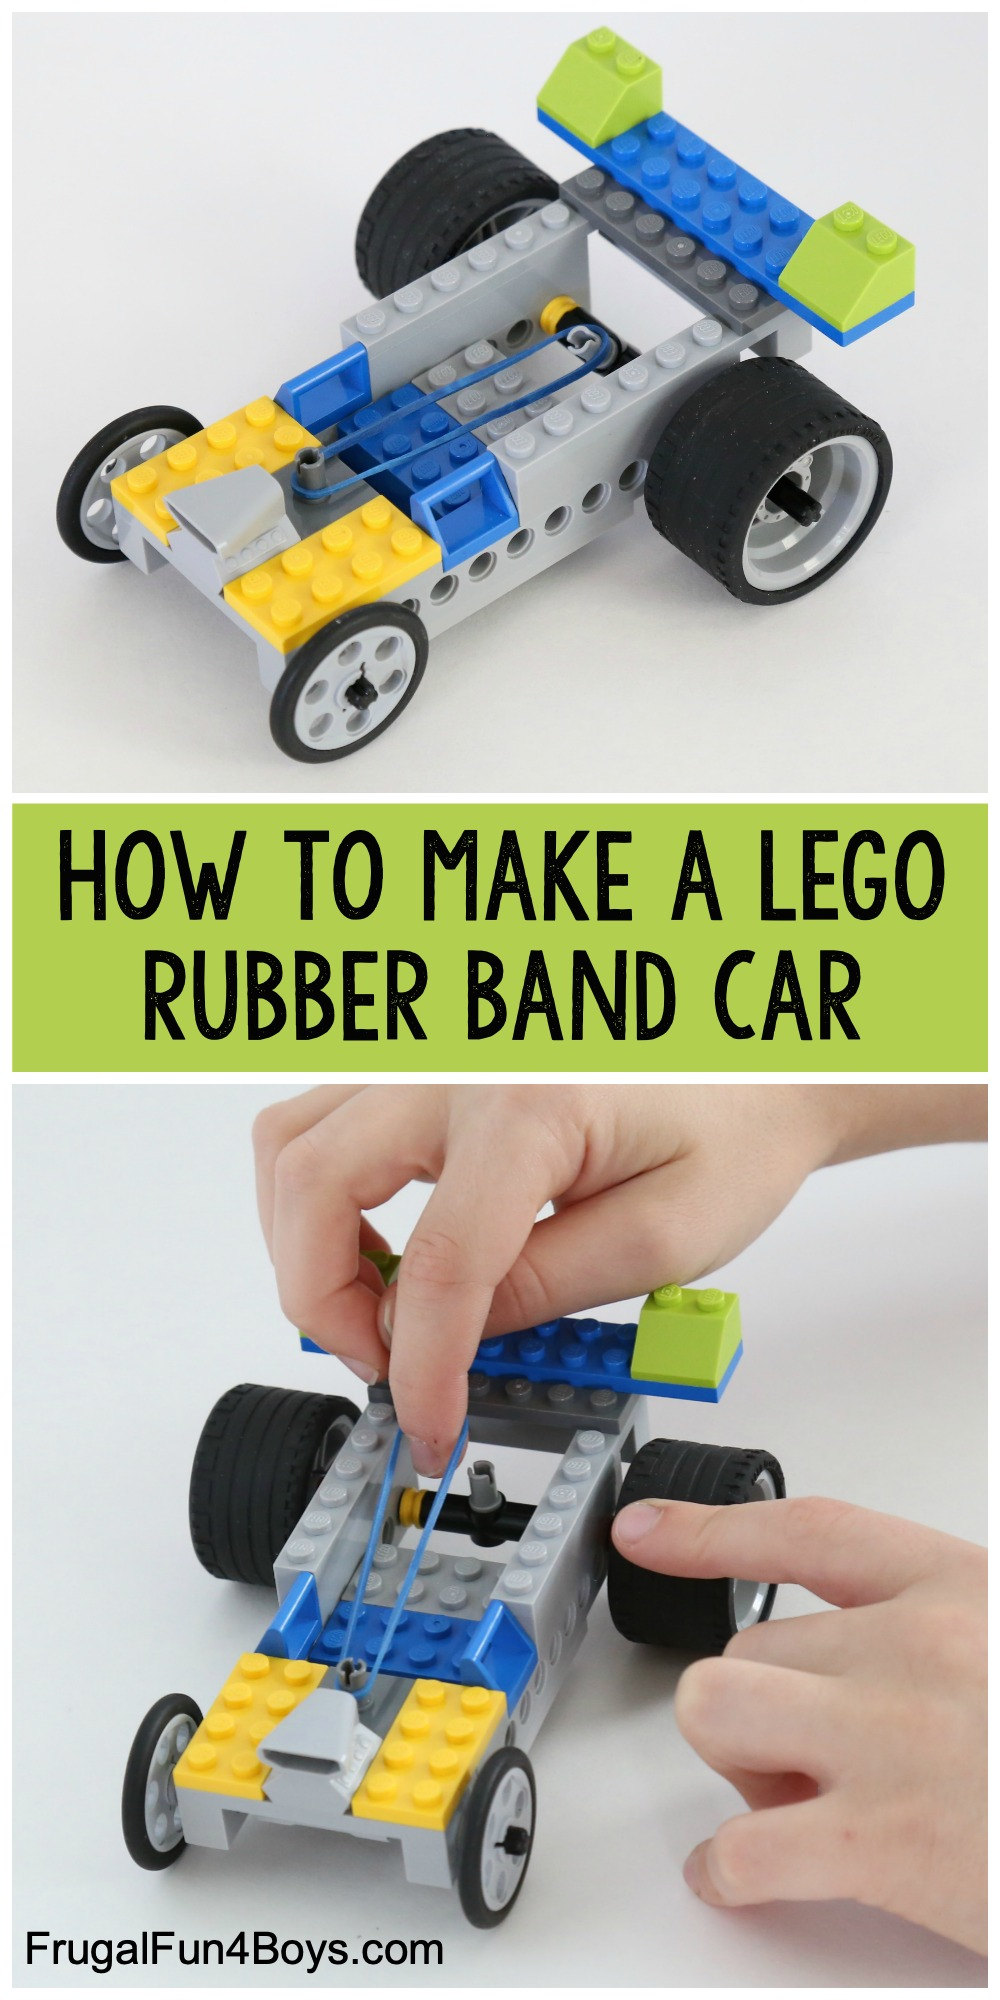 Lego 4 Black 2x2 plate axle tire vehicle car truck